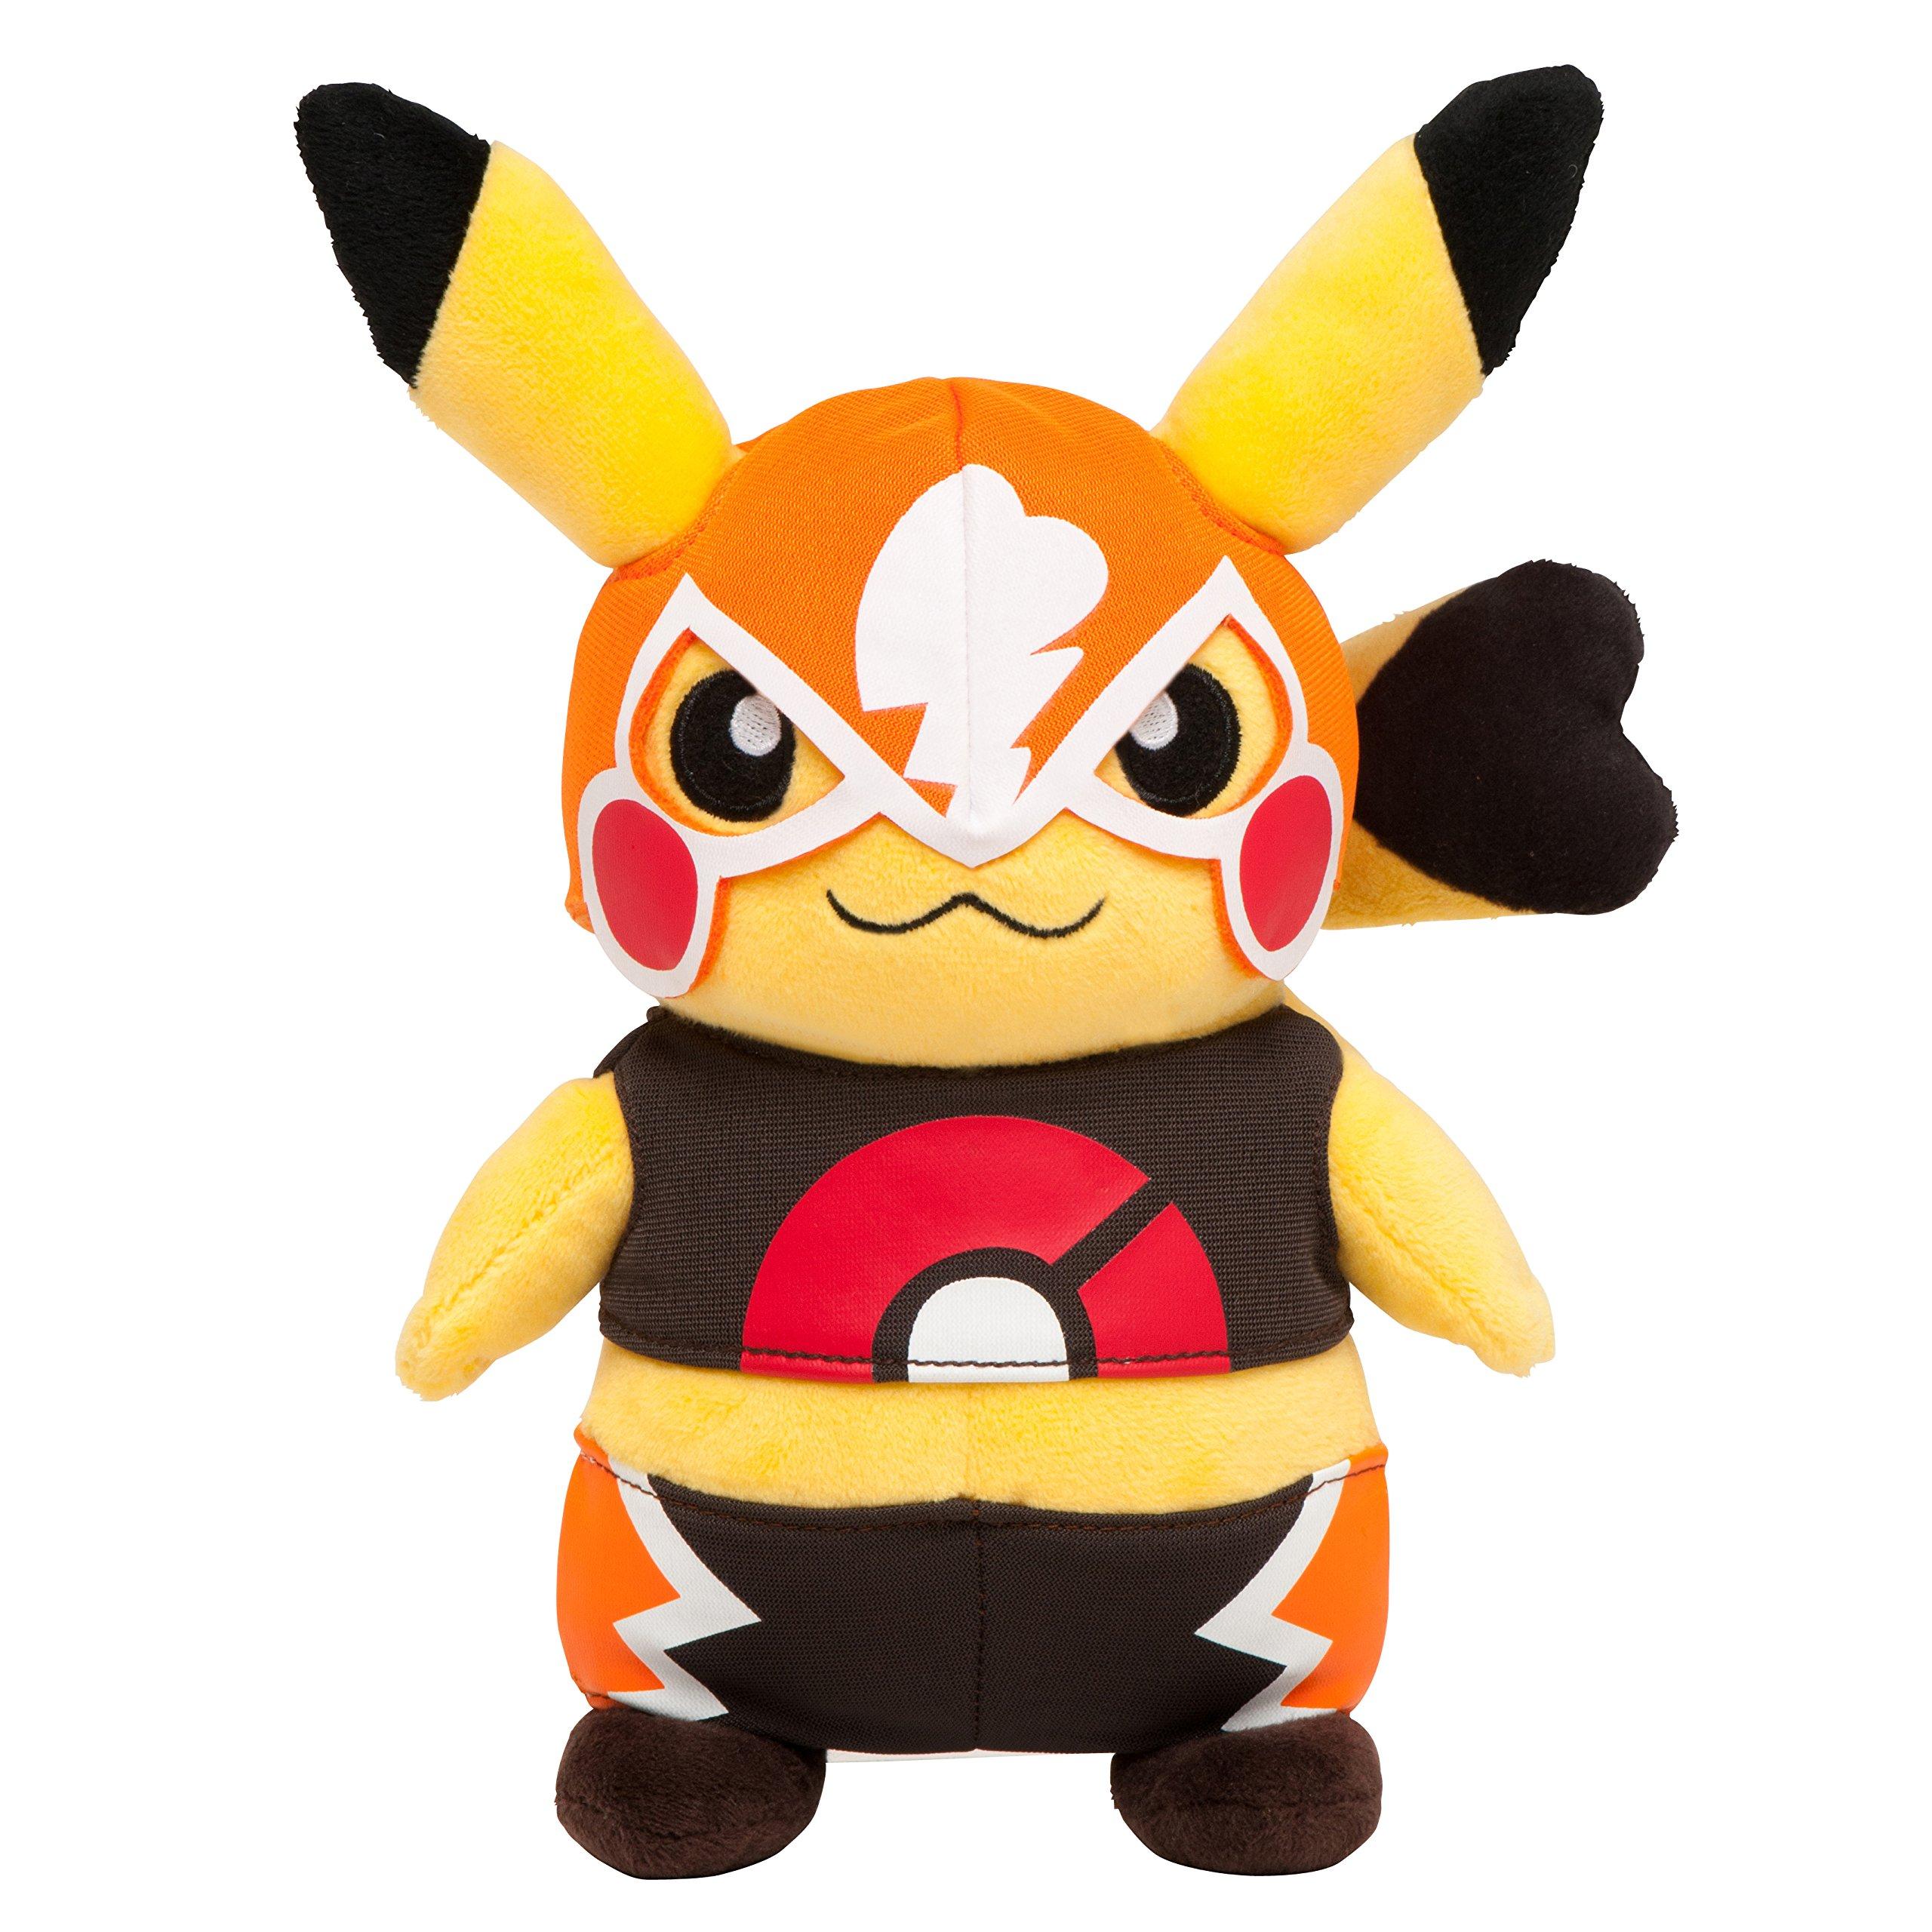 Pokemon Center Plush Doll Masked Pikachu OA Center by Pokemon